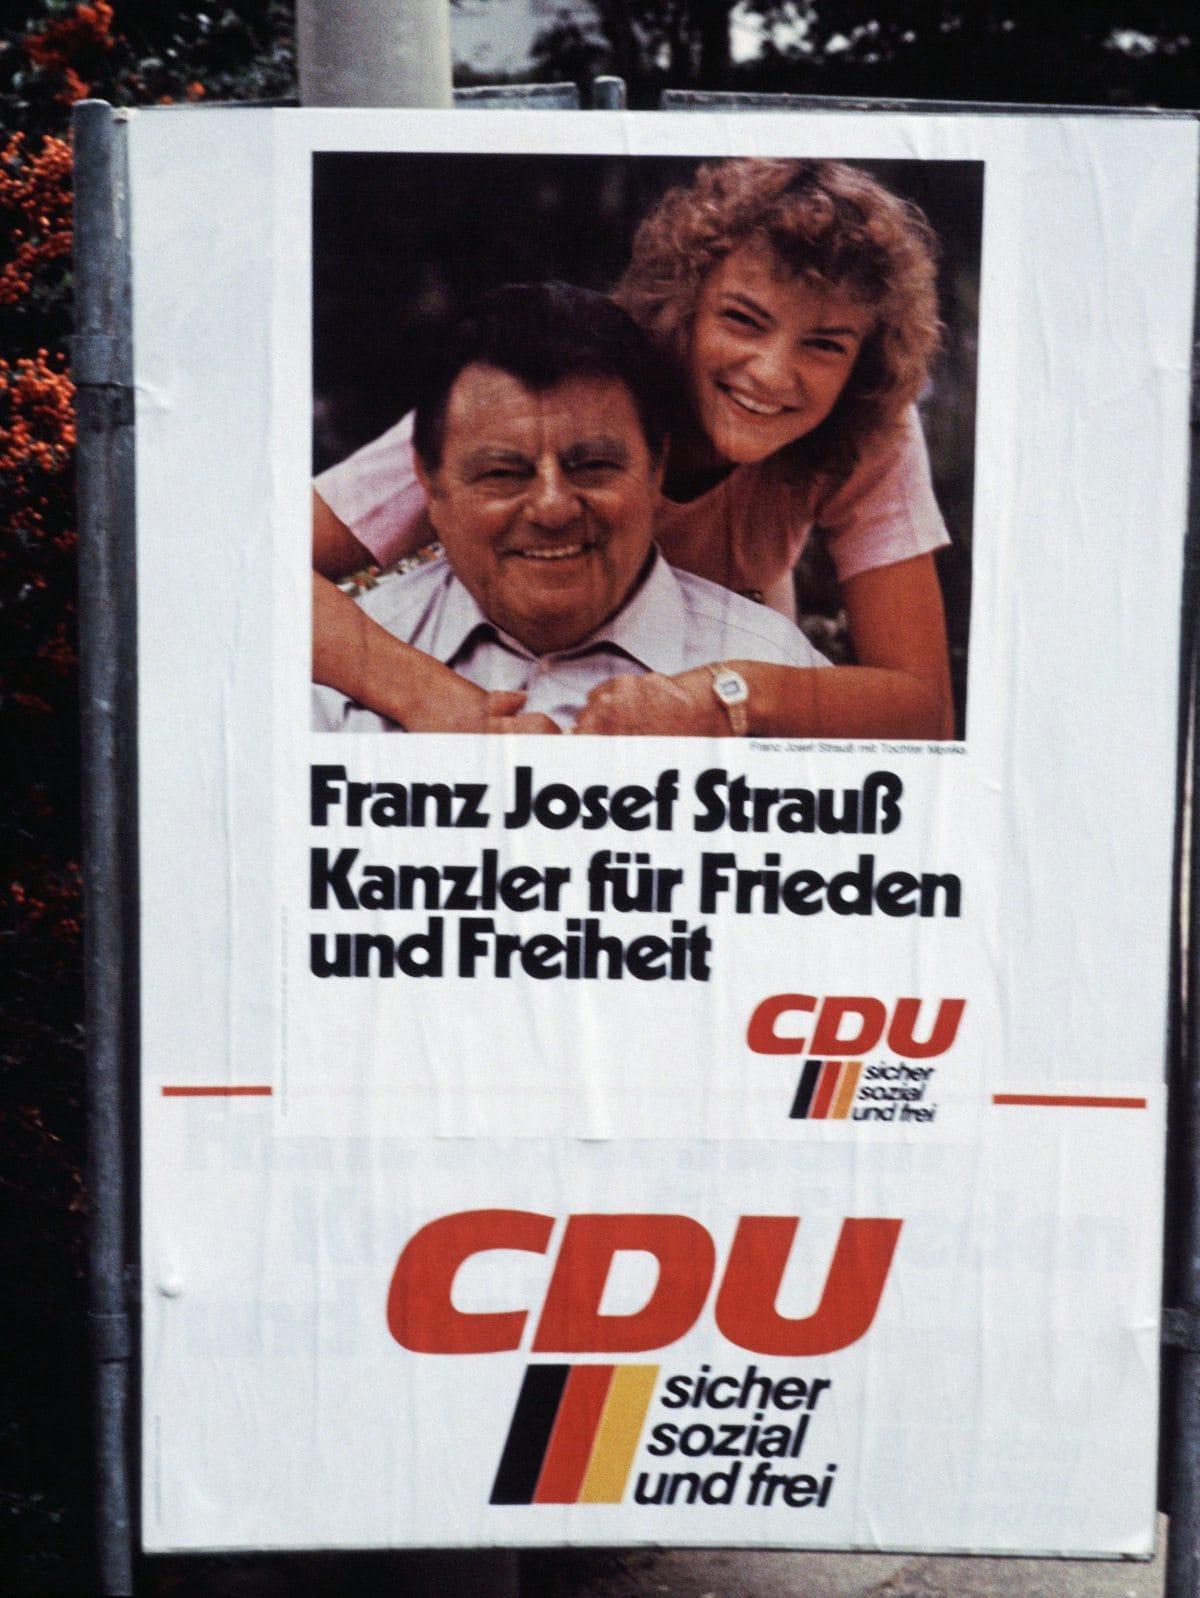 Unionskanzlerkandidat Franz-Josef Strauß im Wahlkampf 1980